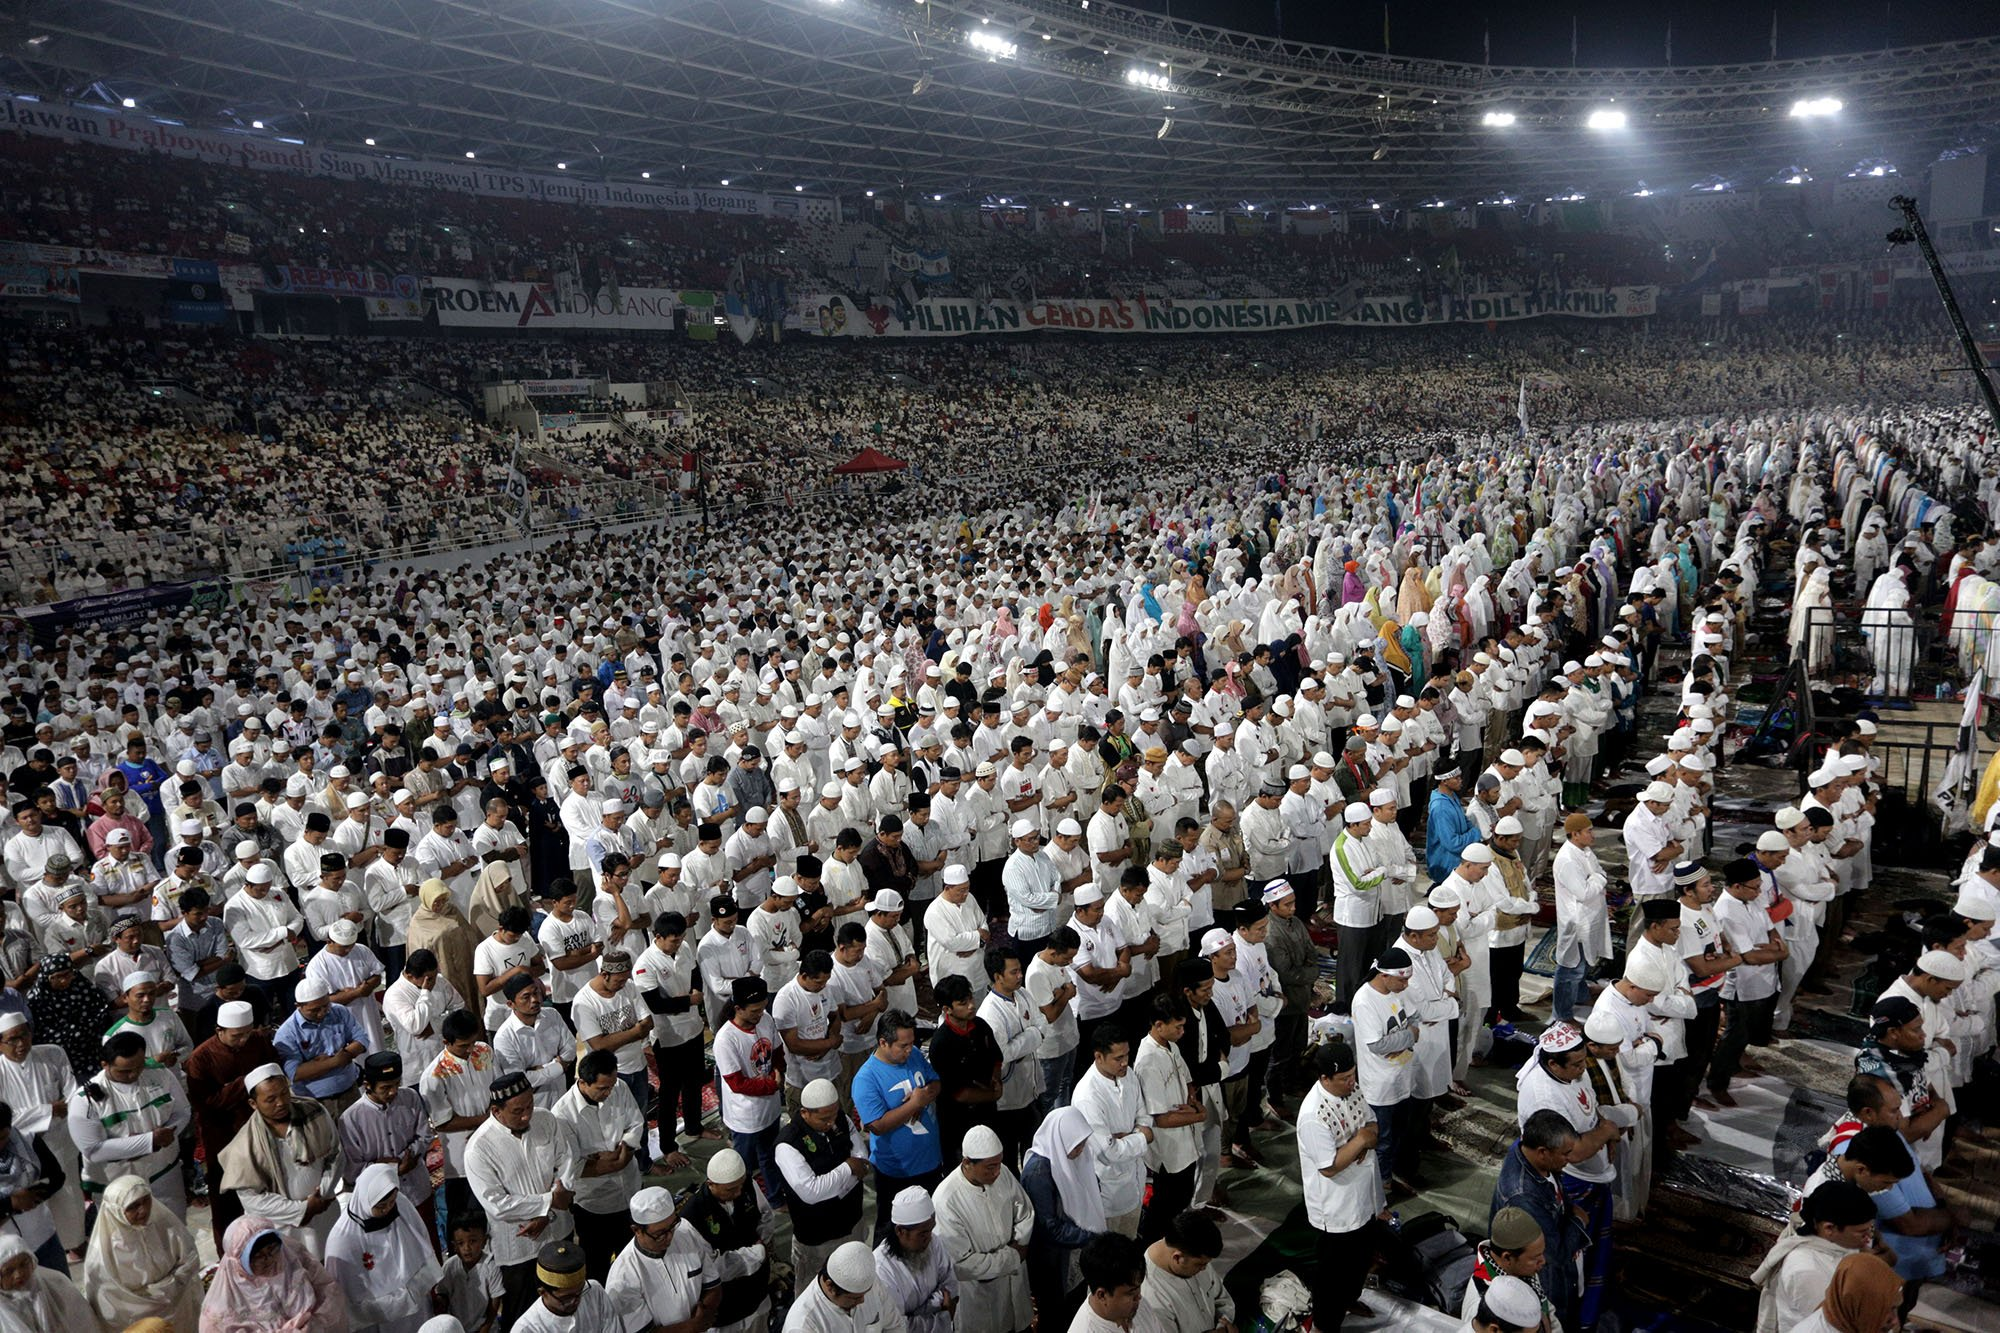 Suasana kampanye akbar oleh pasangan calon peresiden dan wakil presiden nomor urut dua yaitu Prabowo dan Sandiaga Uno di Gelora Bung Karno, Jakarta (7/4).